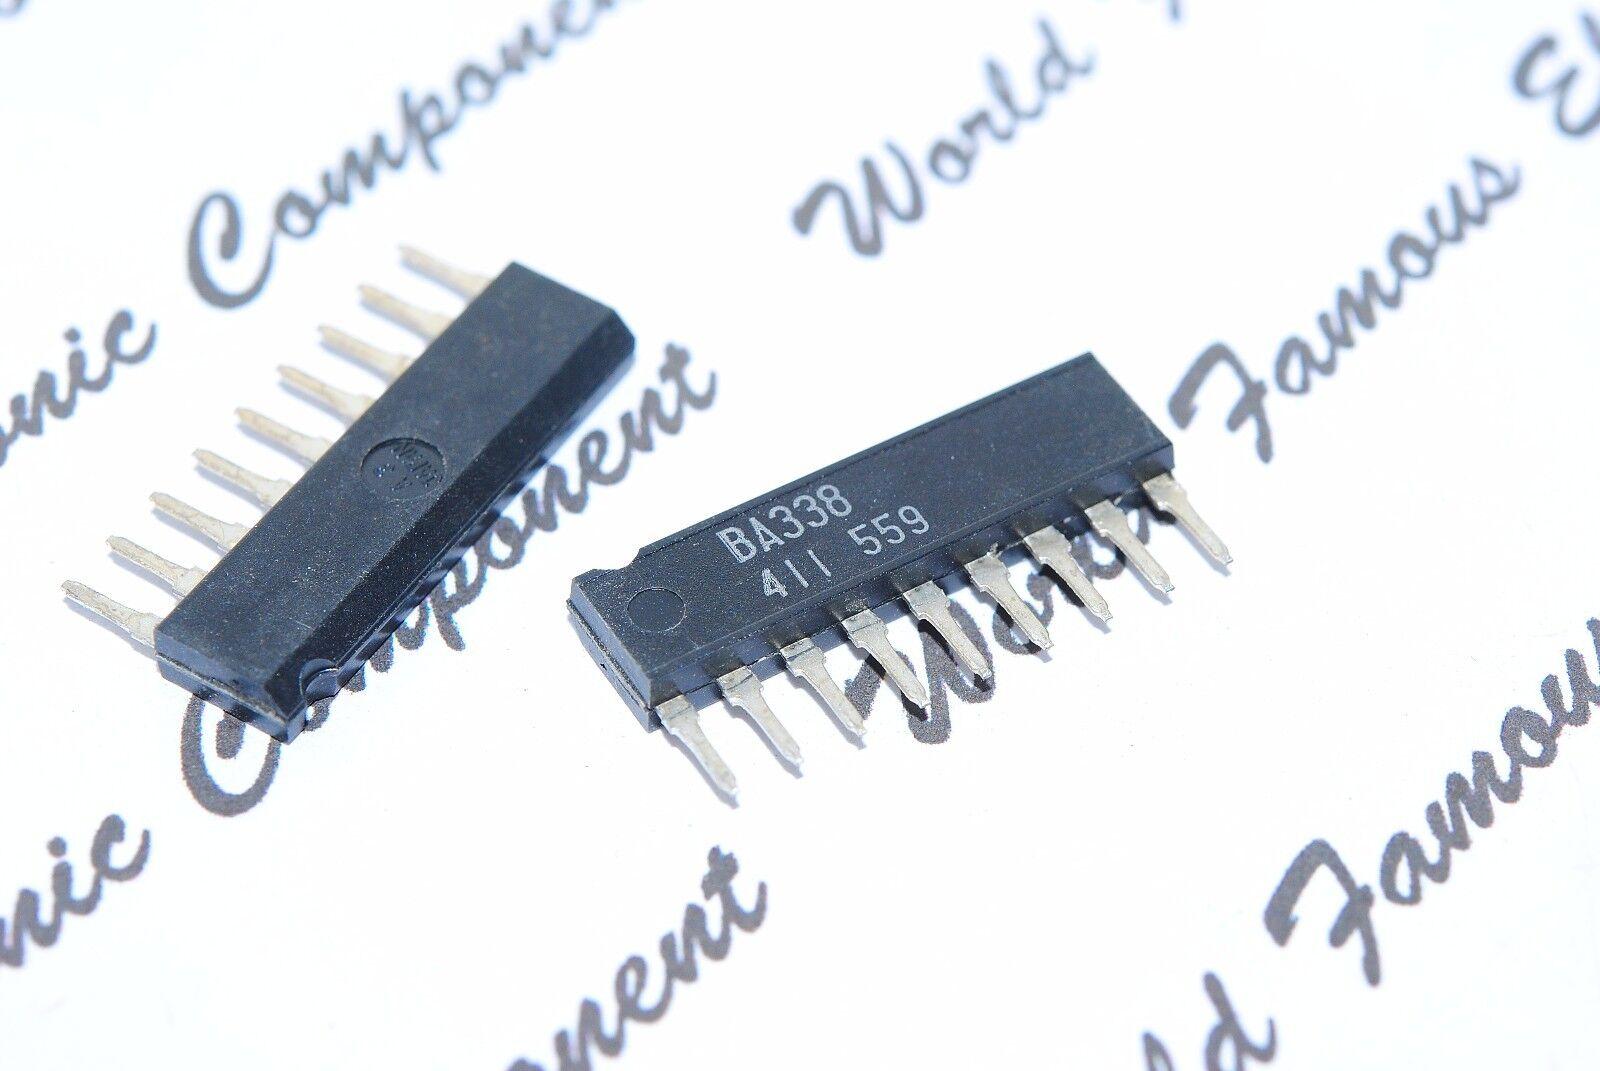 - Genuine TBA570A Integrated Circuit 1pcs IC